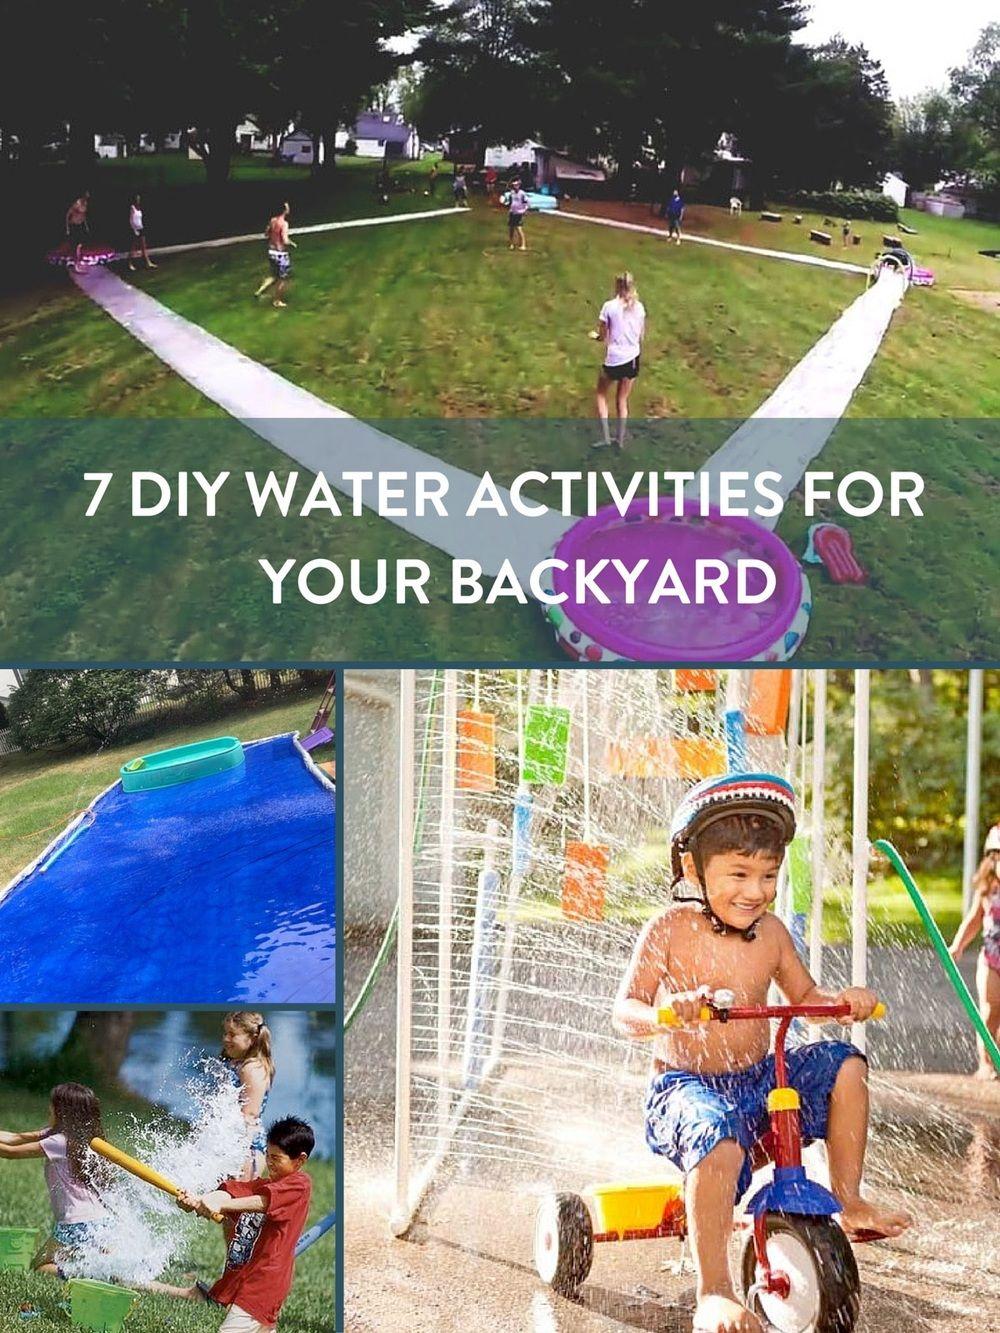 Roundup 7 Diy Water Activities For Your Backyard Backyard Activities Summer Water Activities Backyard Water Fun Backyard diy water park